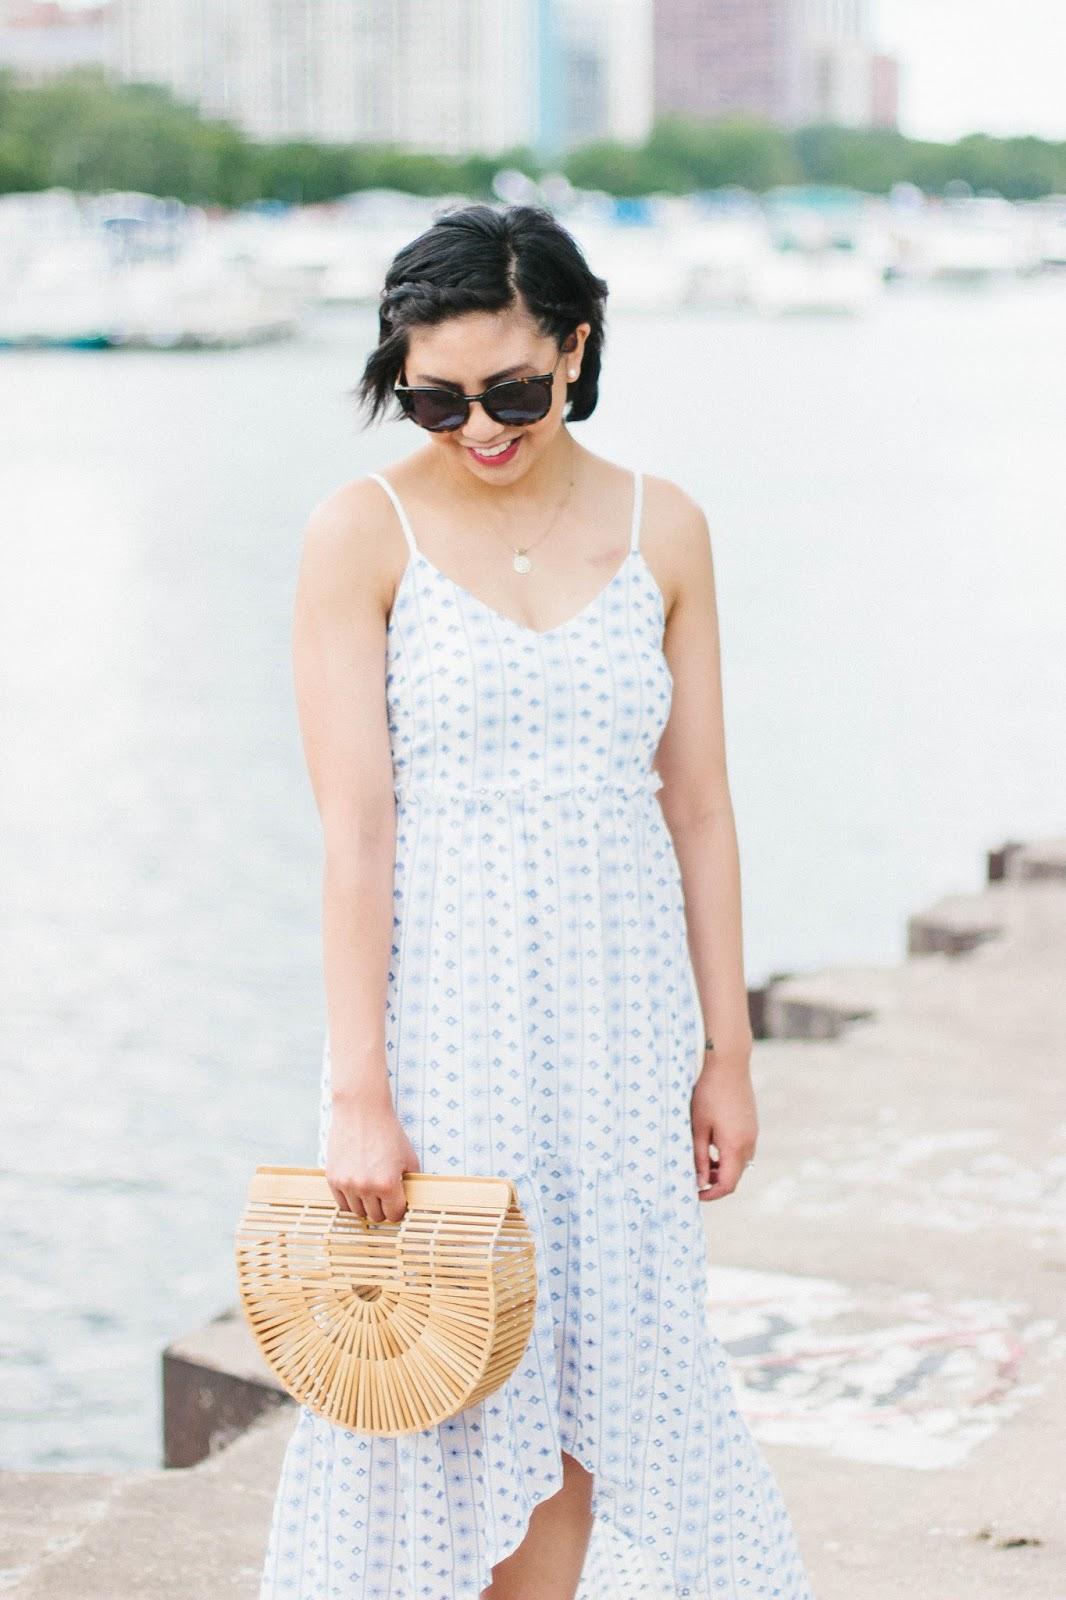 The Best Maxi Dress for Semi-Petite Women